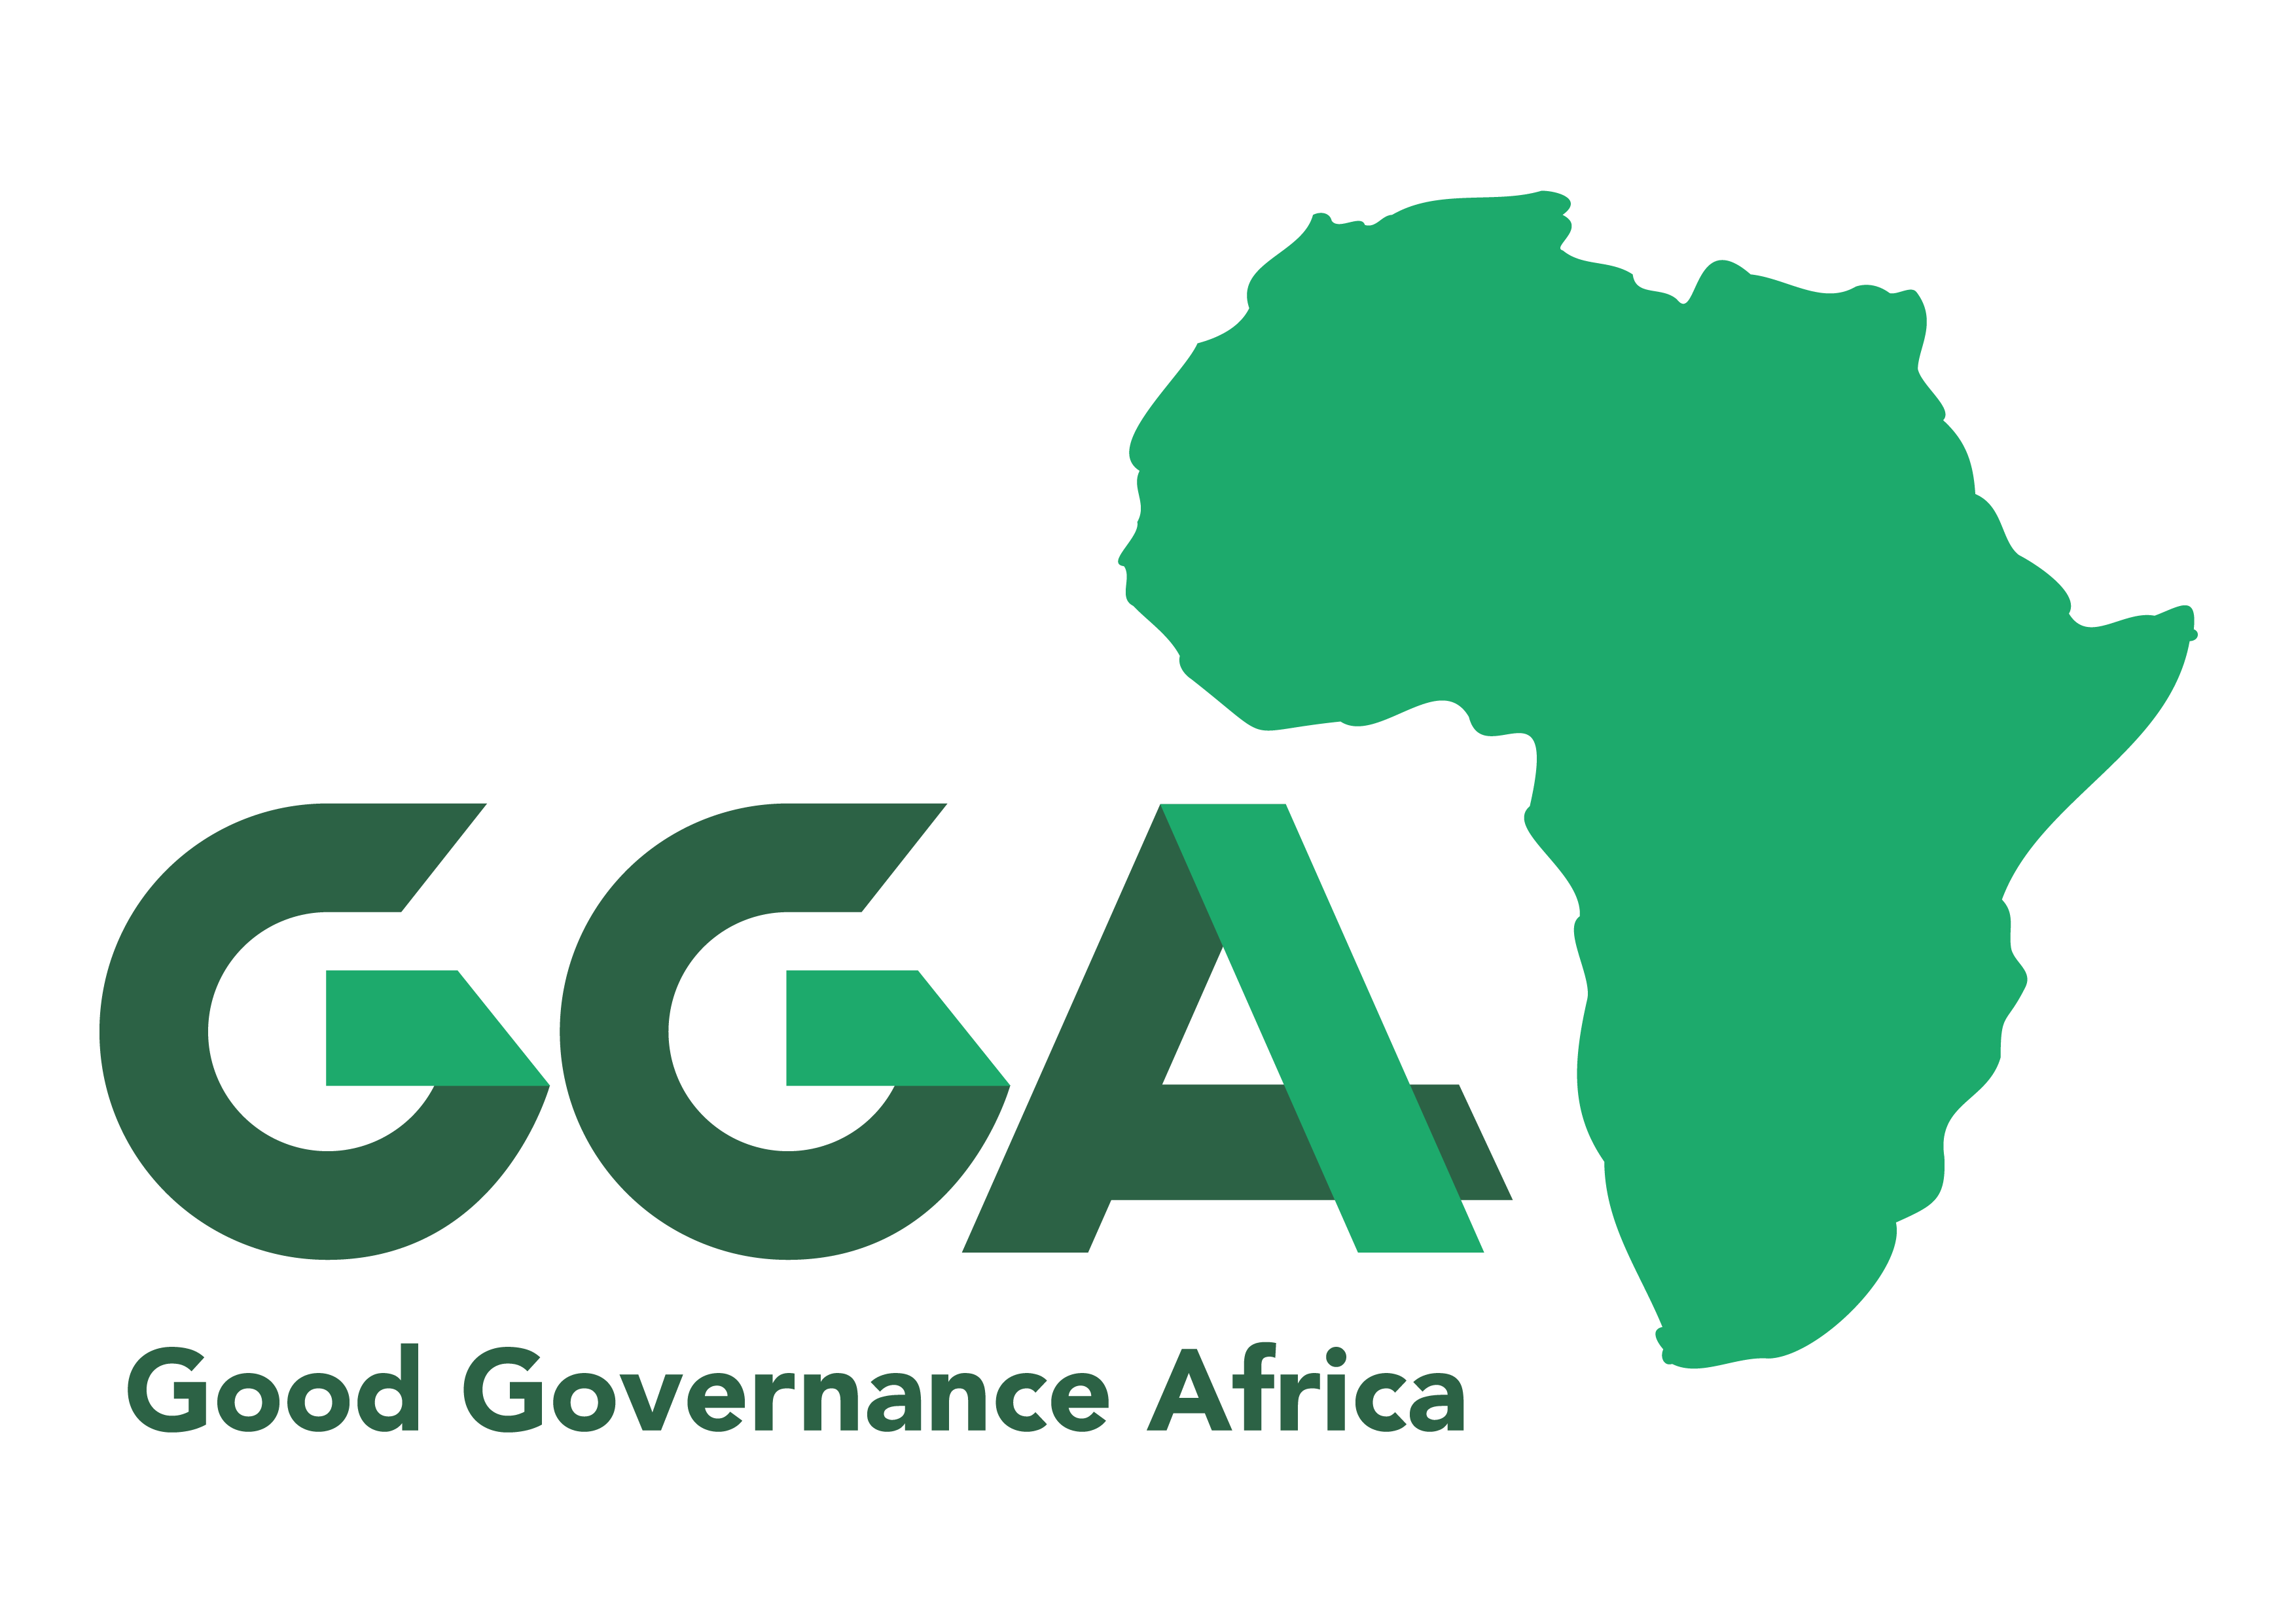 Good Governance Africa